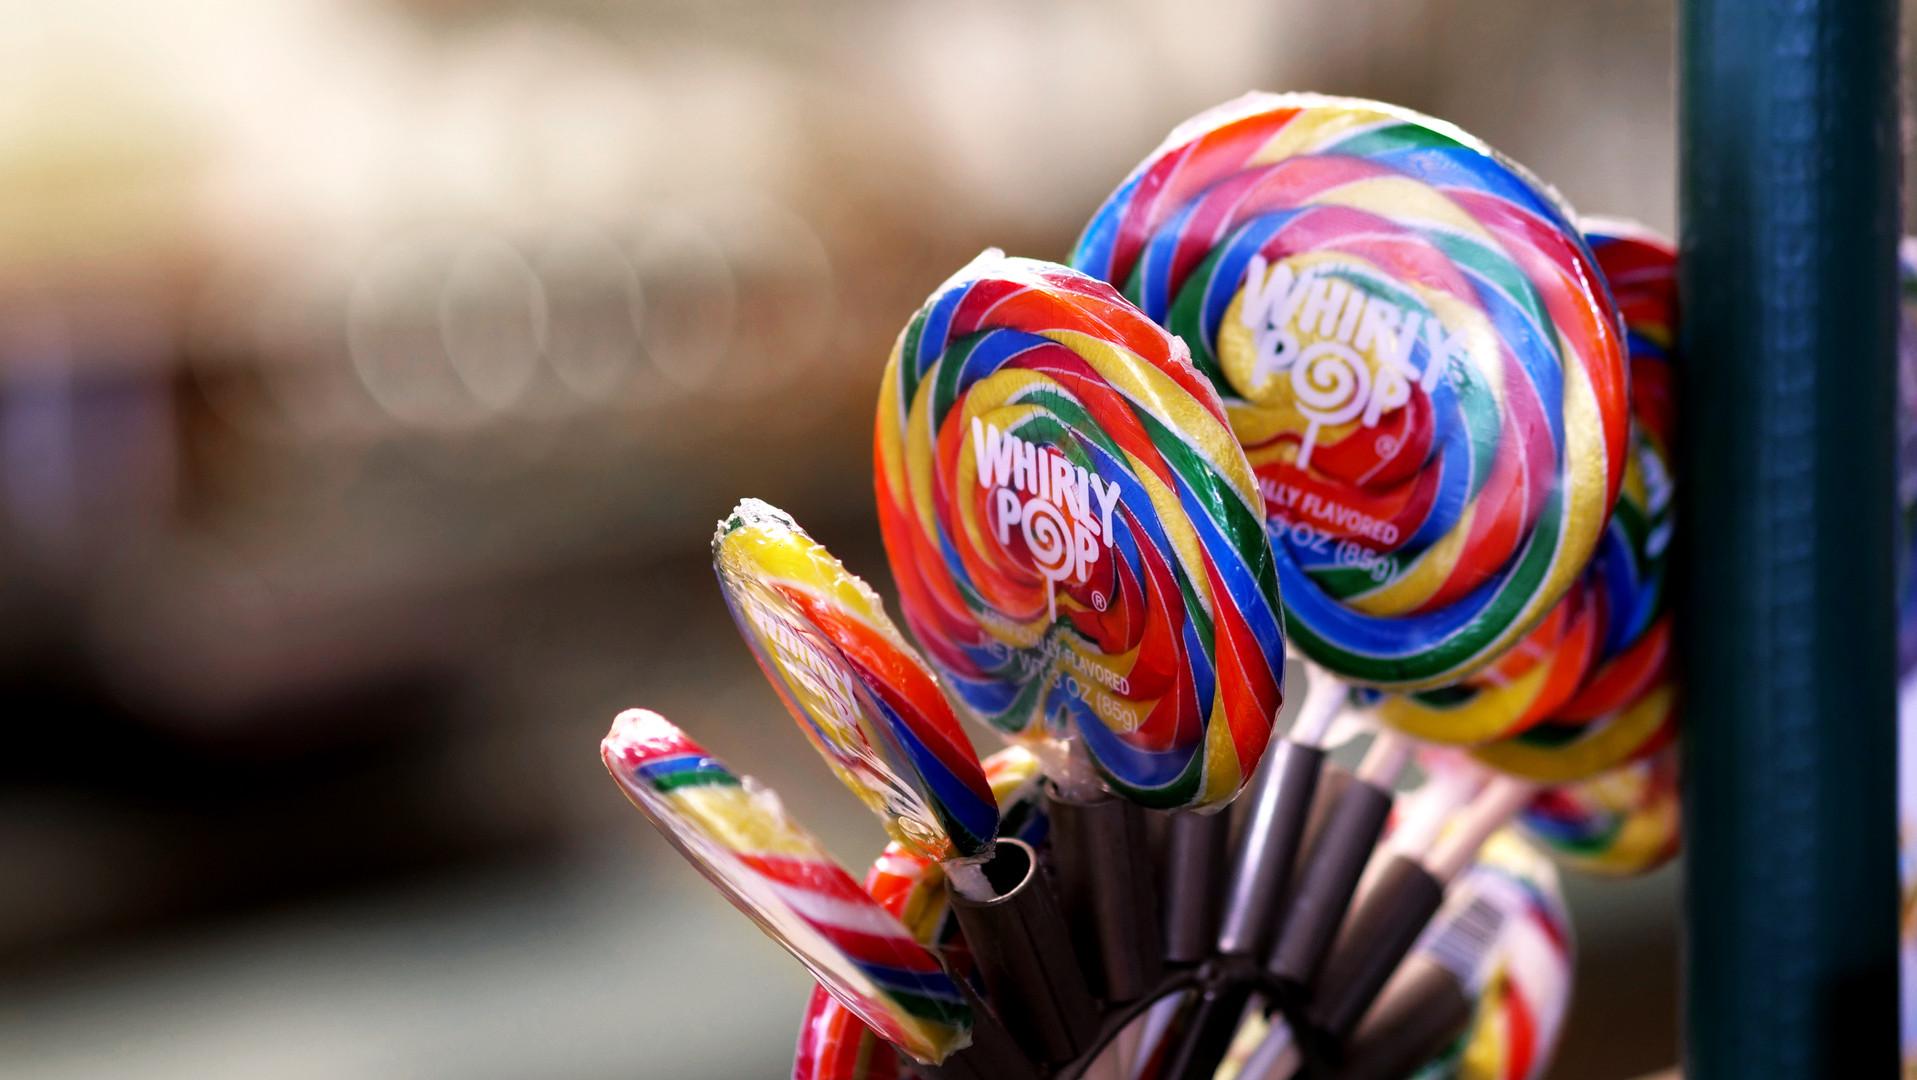 Whirly Pop